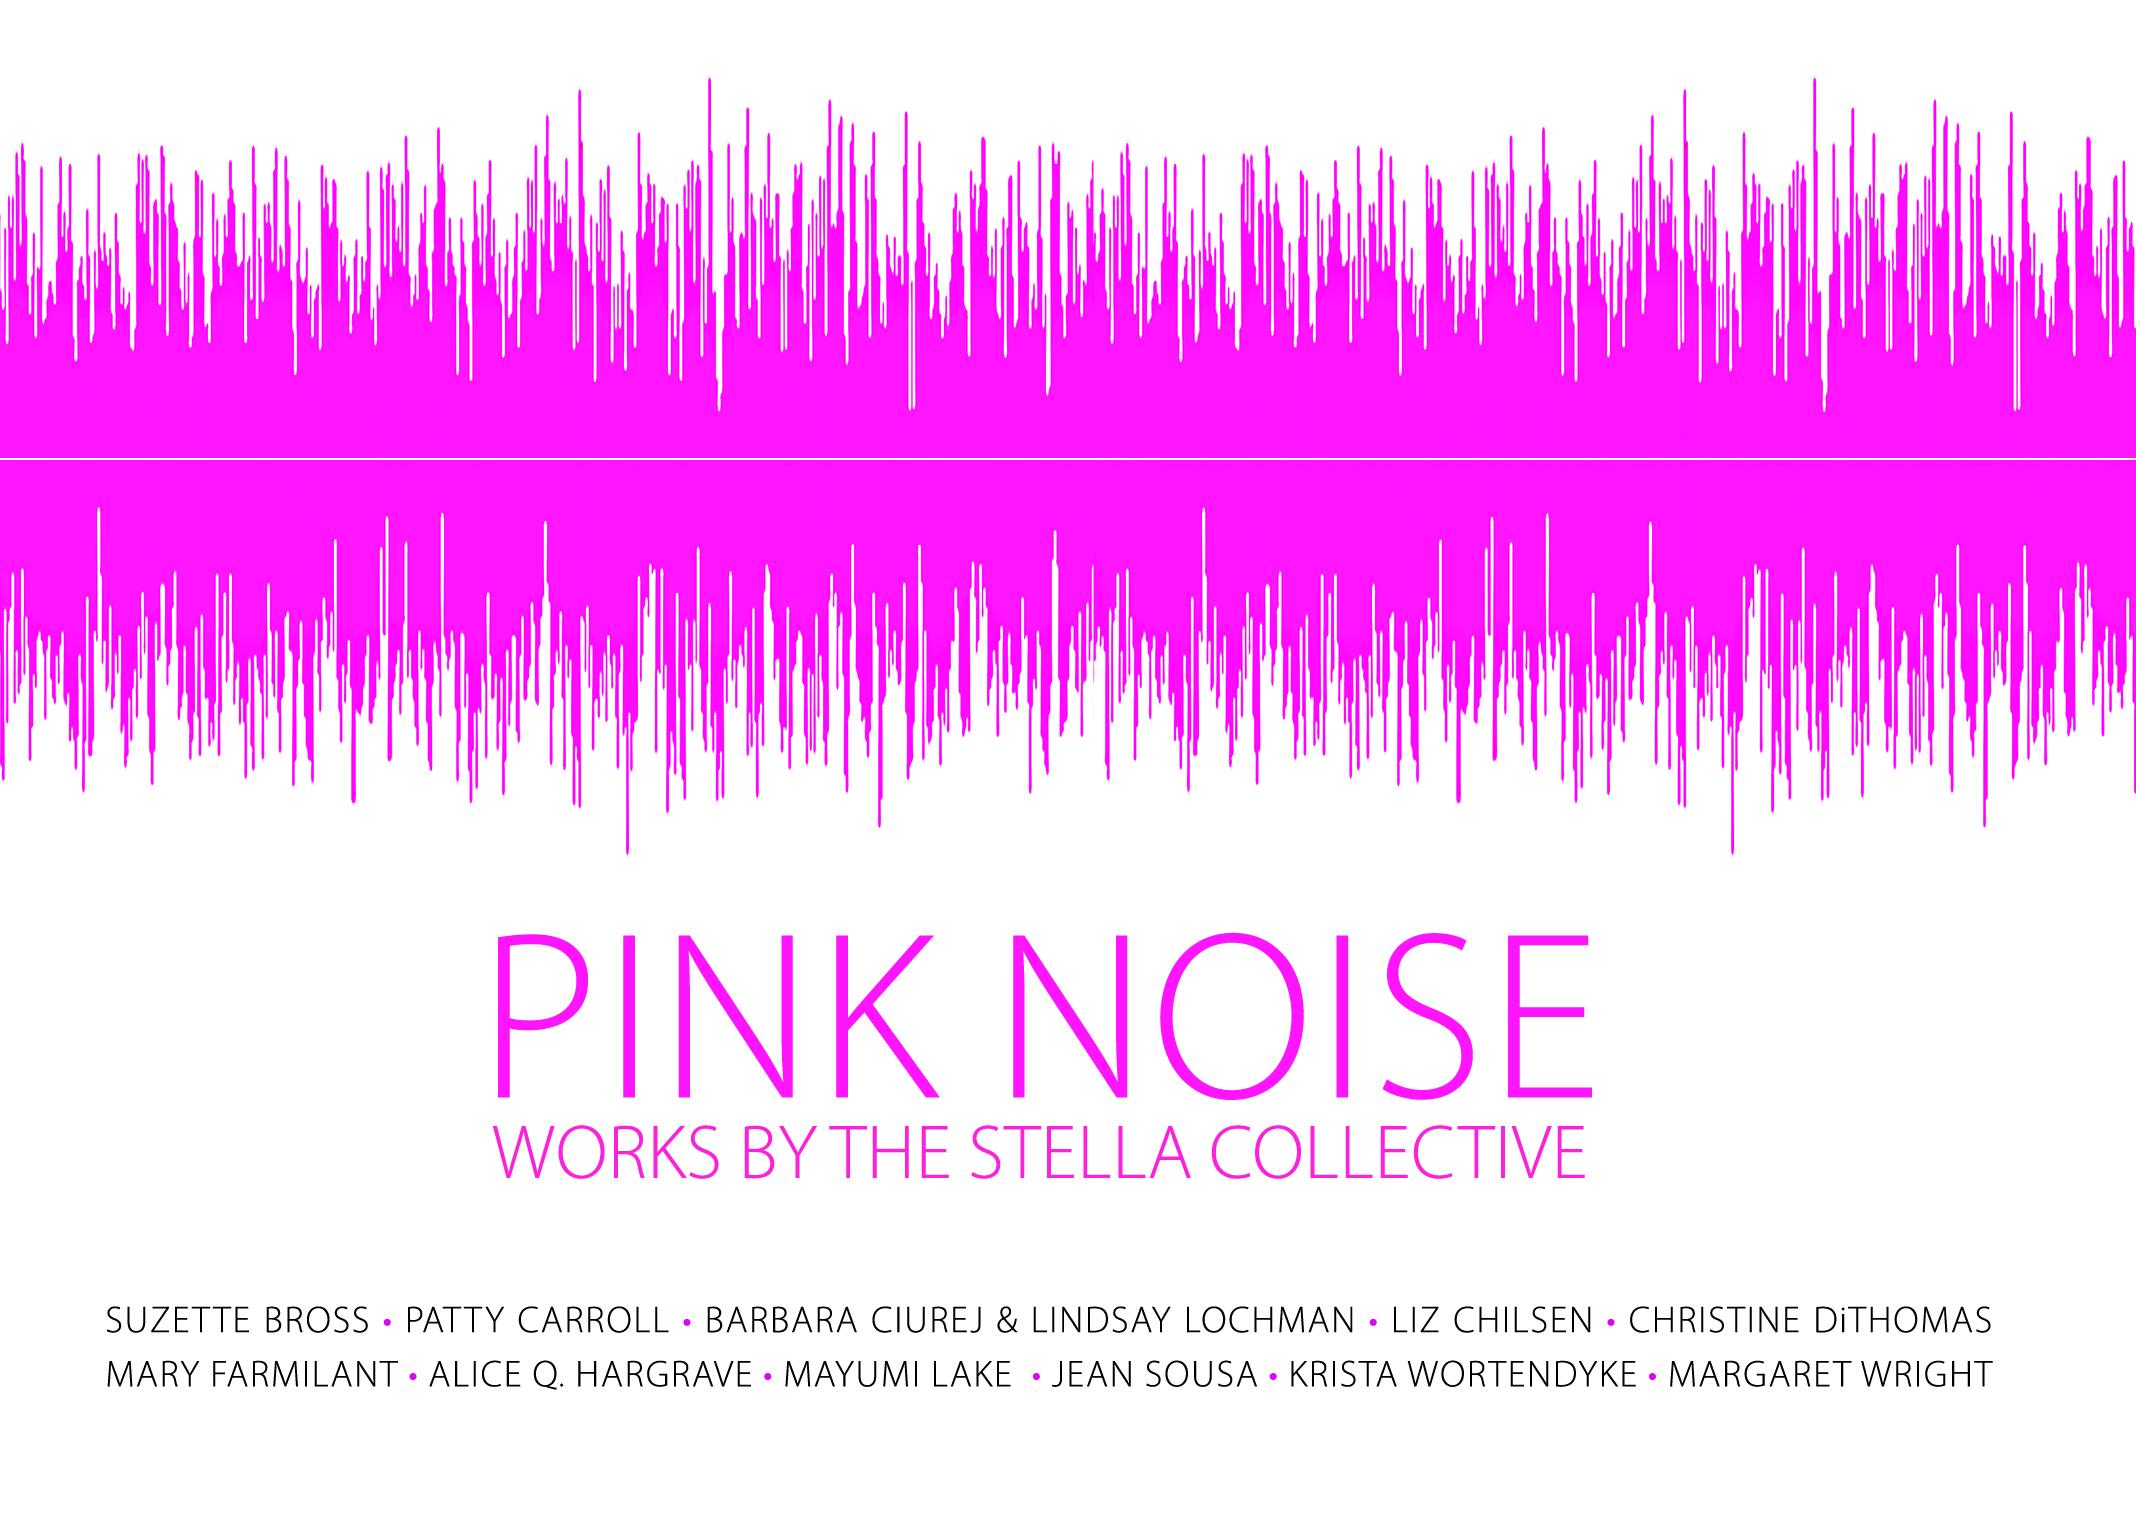 PinkNoise_5x7CARD_FINAL.jpg